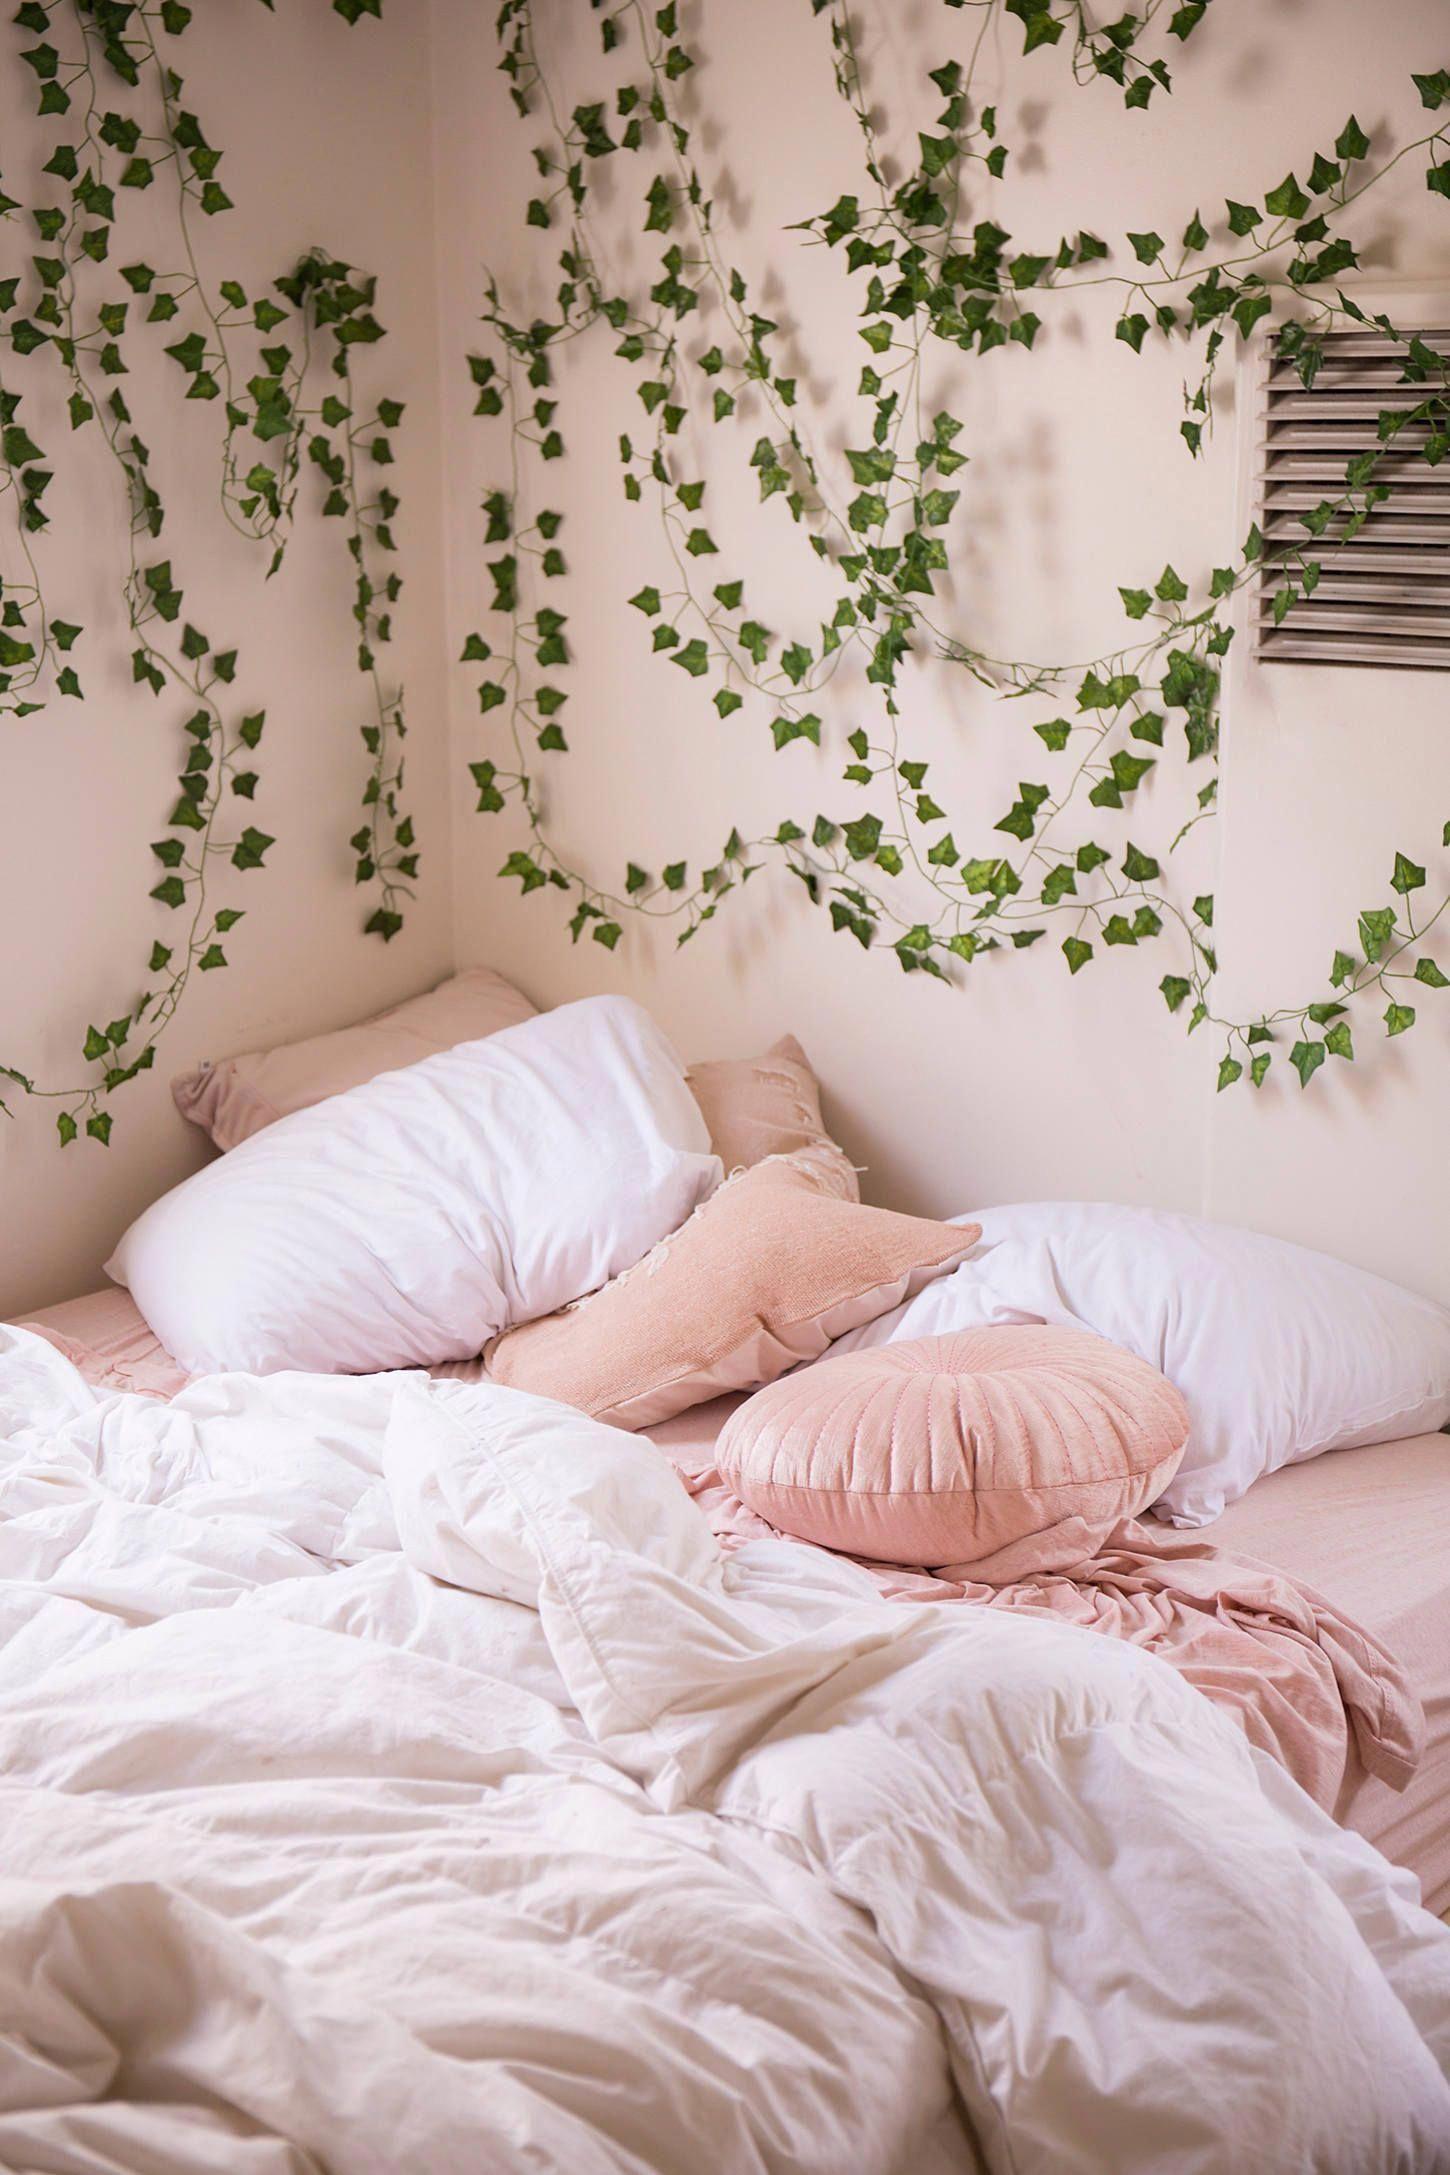 Decorative Vines Set In 2020 Cute Dorm Rooms Home Decor Bedroom